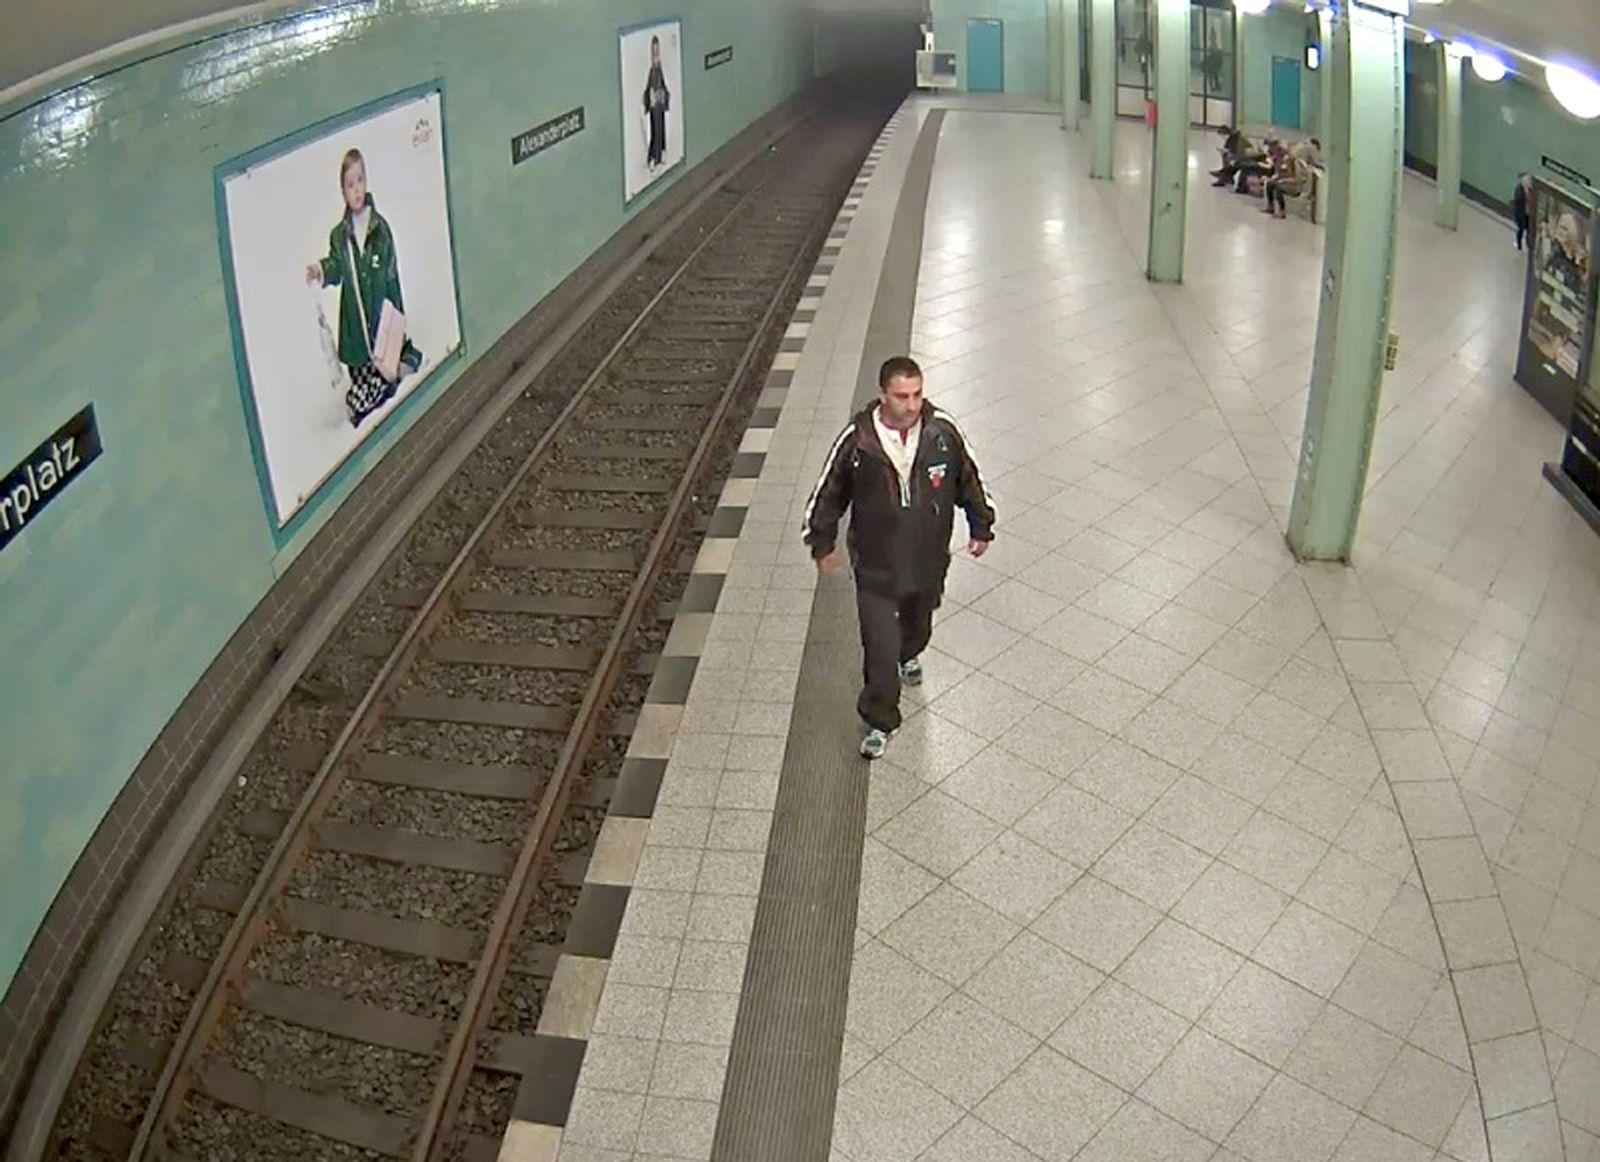 Erneut Angriff auf U-Bahntreppe